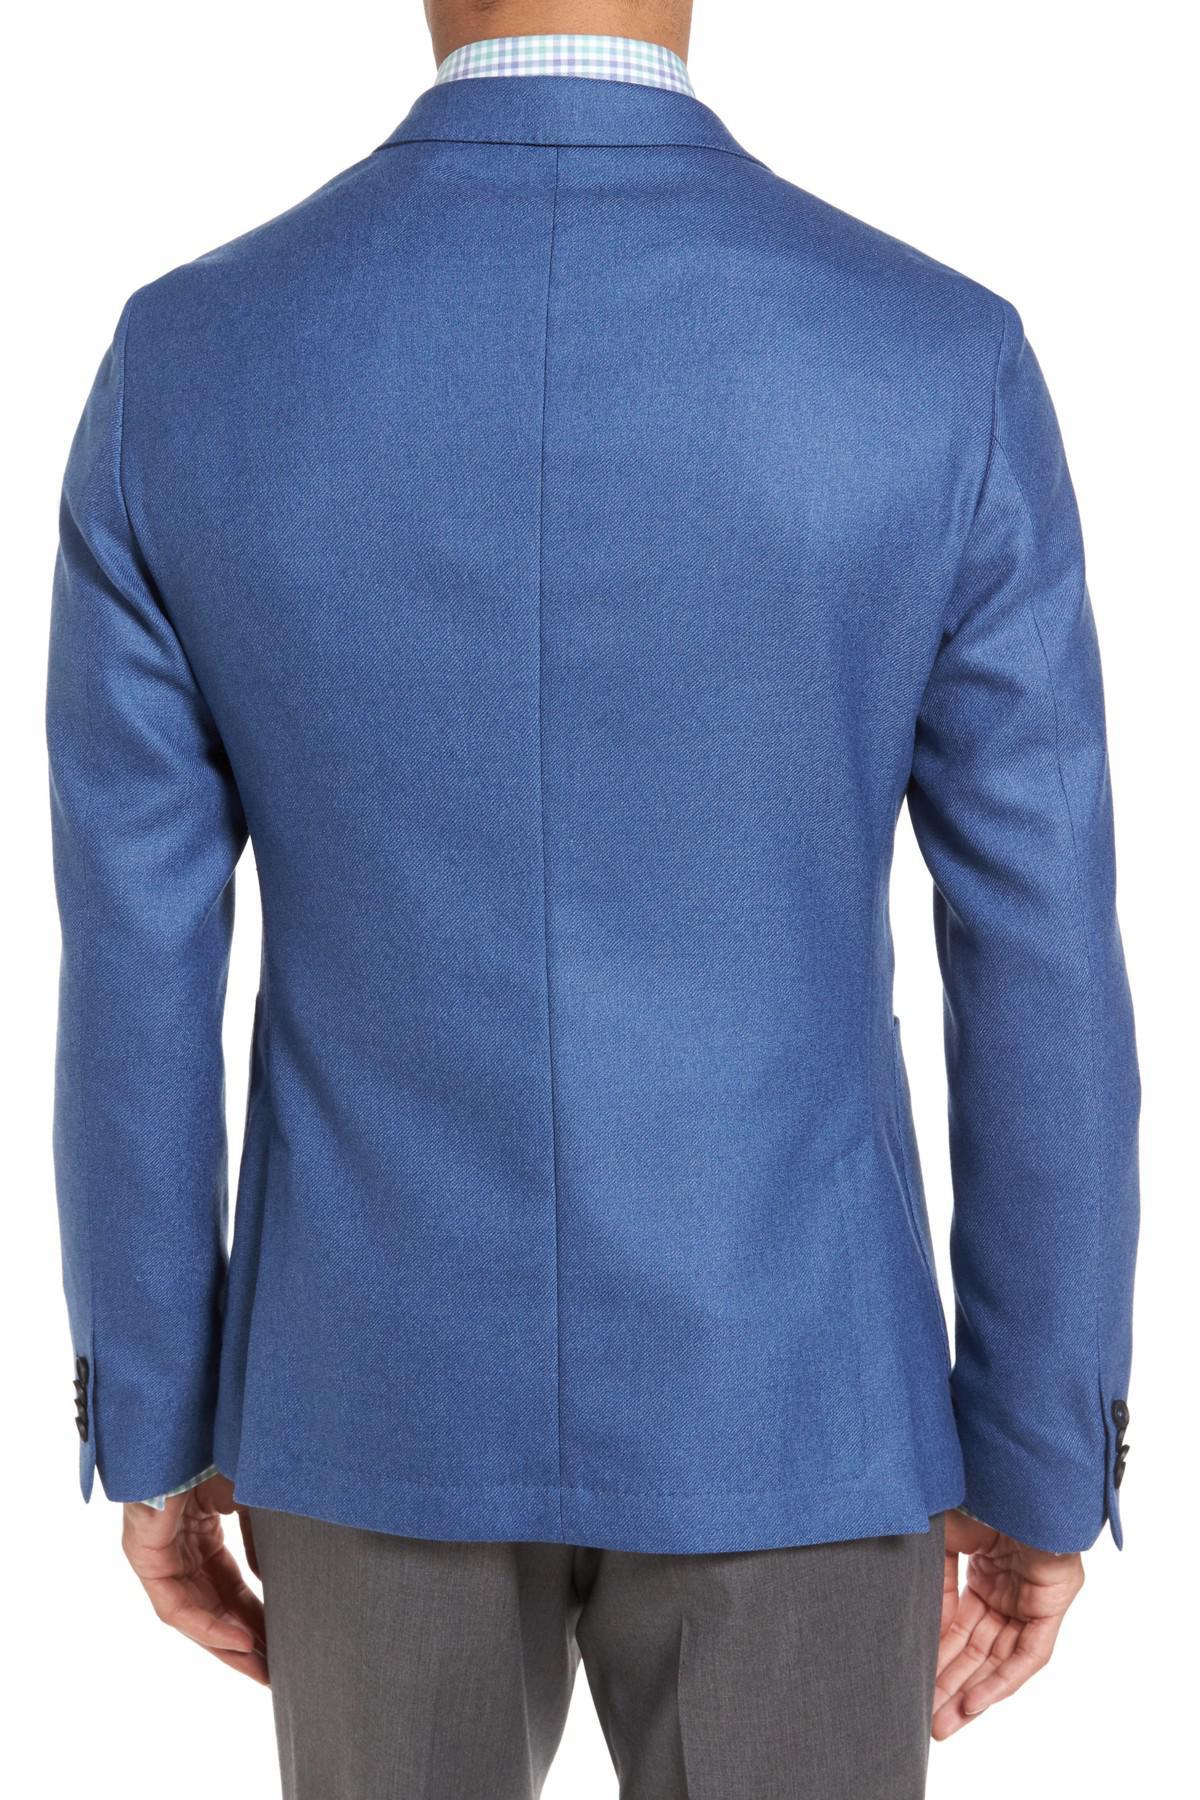 c3843c9408 Lyst - Boss Nold Trim Fit Wool Blazer in Blue for Men